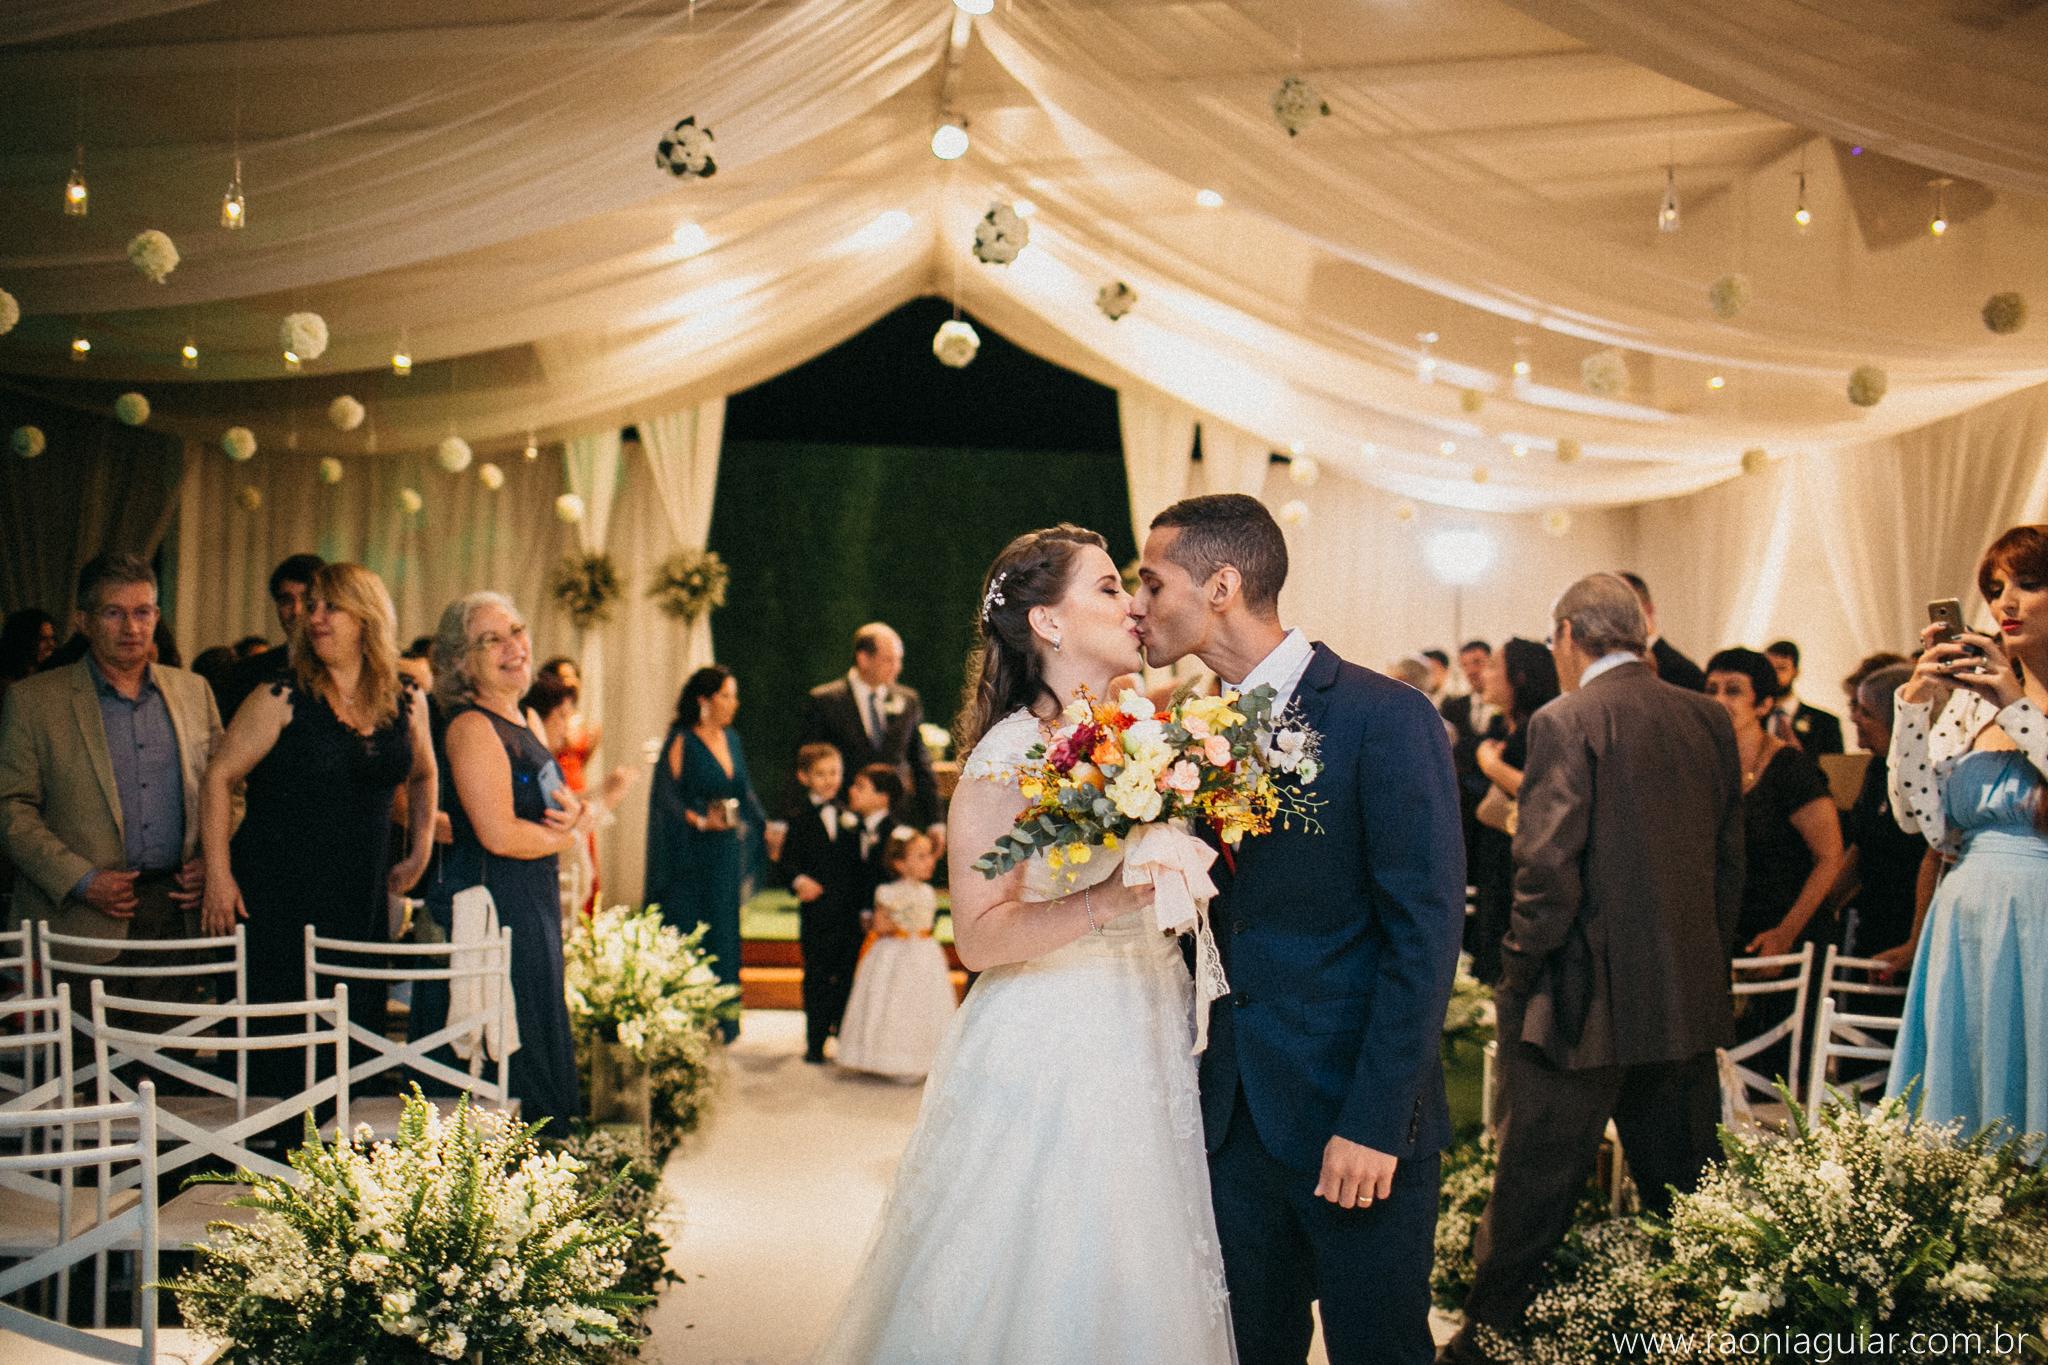 2018.10 Casamento Rebeca Soares e Felipe 0398.jpg